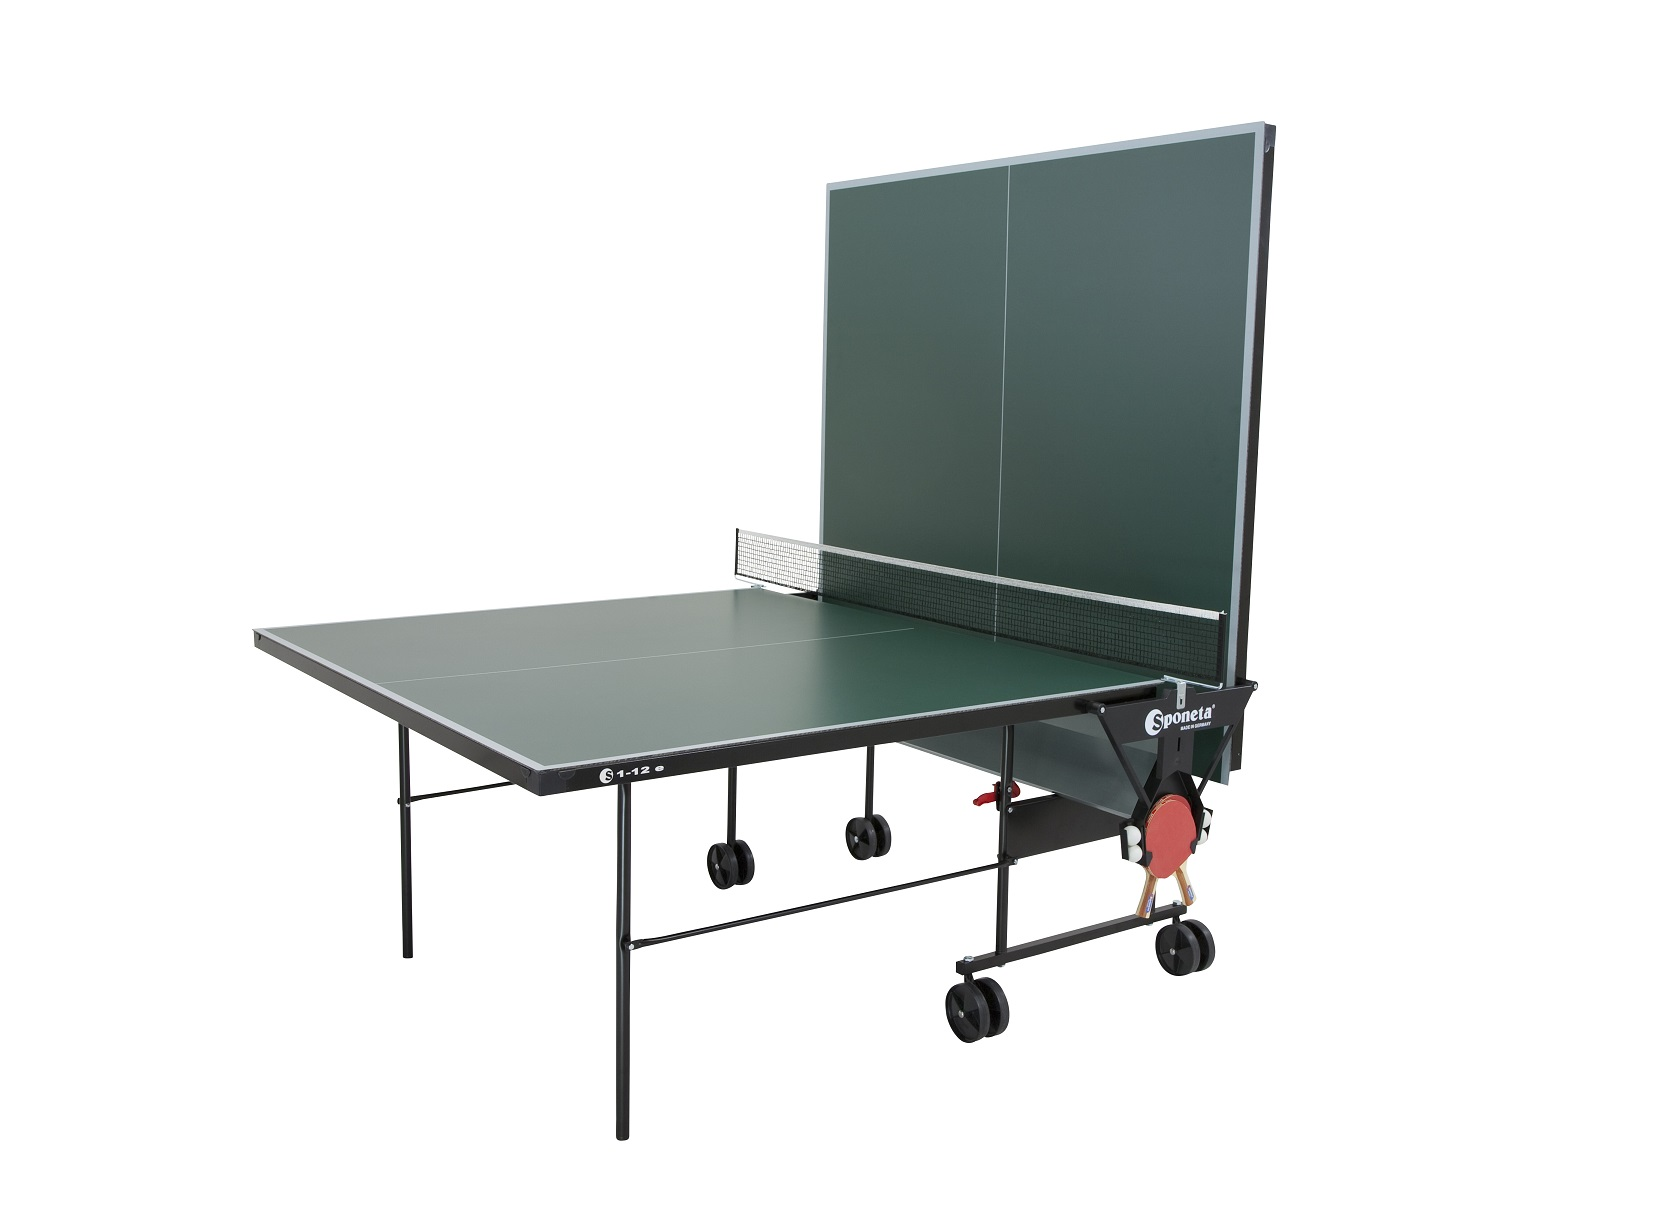 baumarkt markmiller werkers welt sport camping sport spielger te sponeta. Black Bedroom Furniture Sets. Home Design Ideas